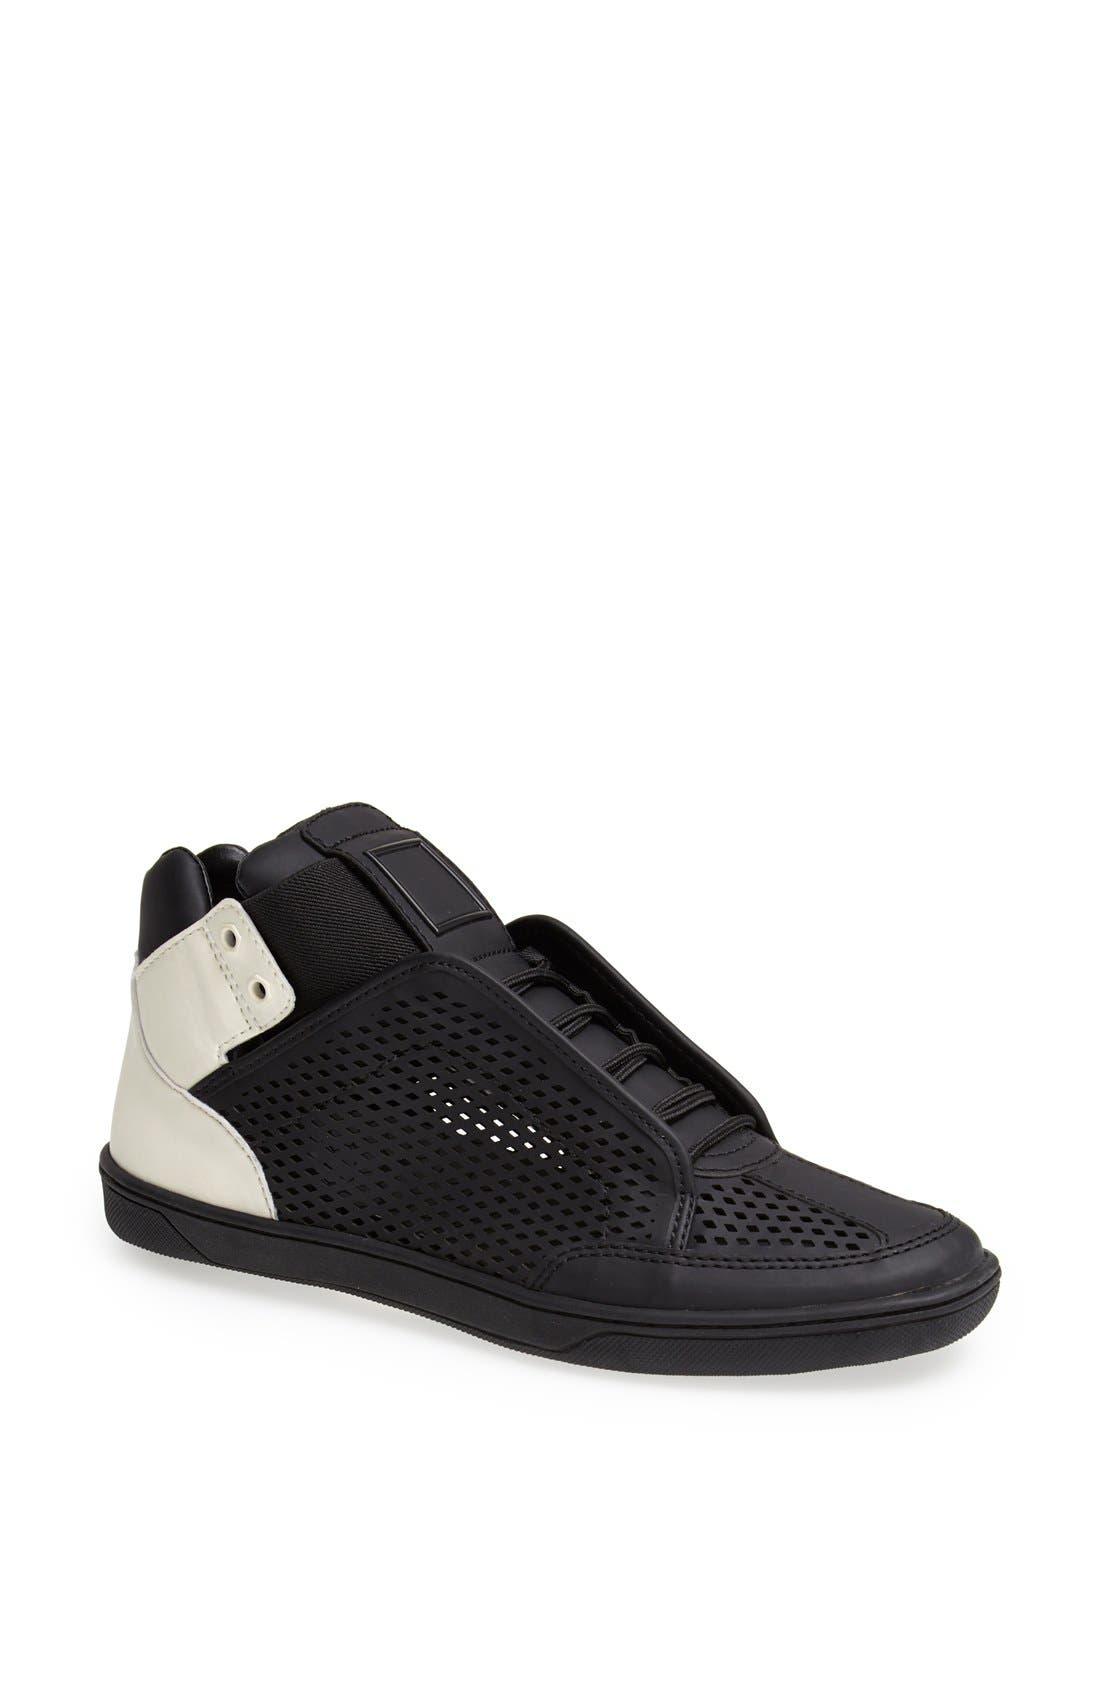 Alternate Image 1 Selected - Dolce Vita 'Vinna' Sneaker